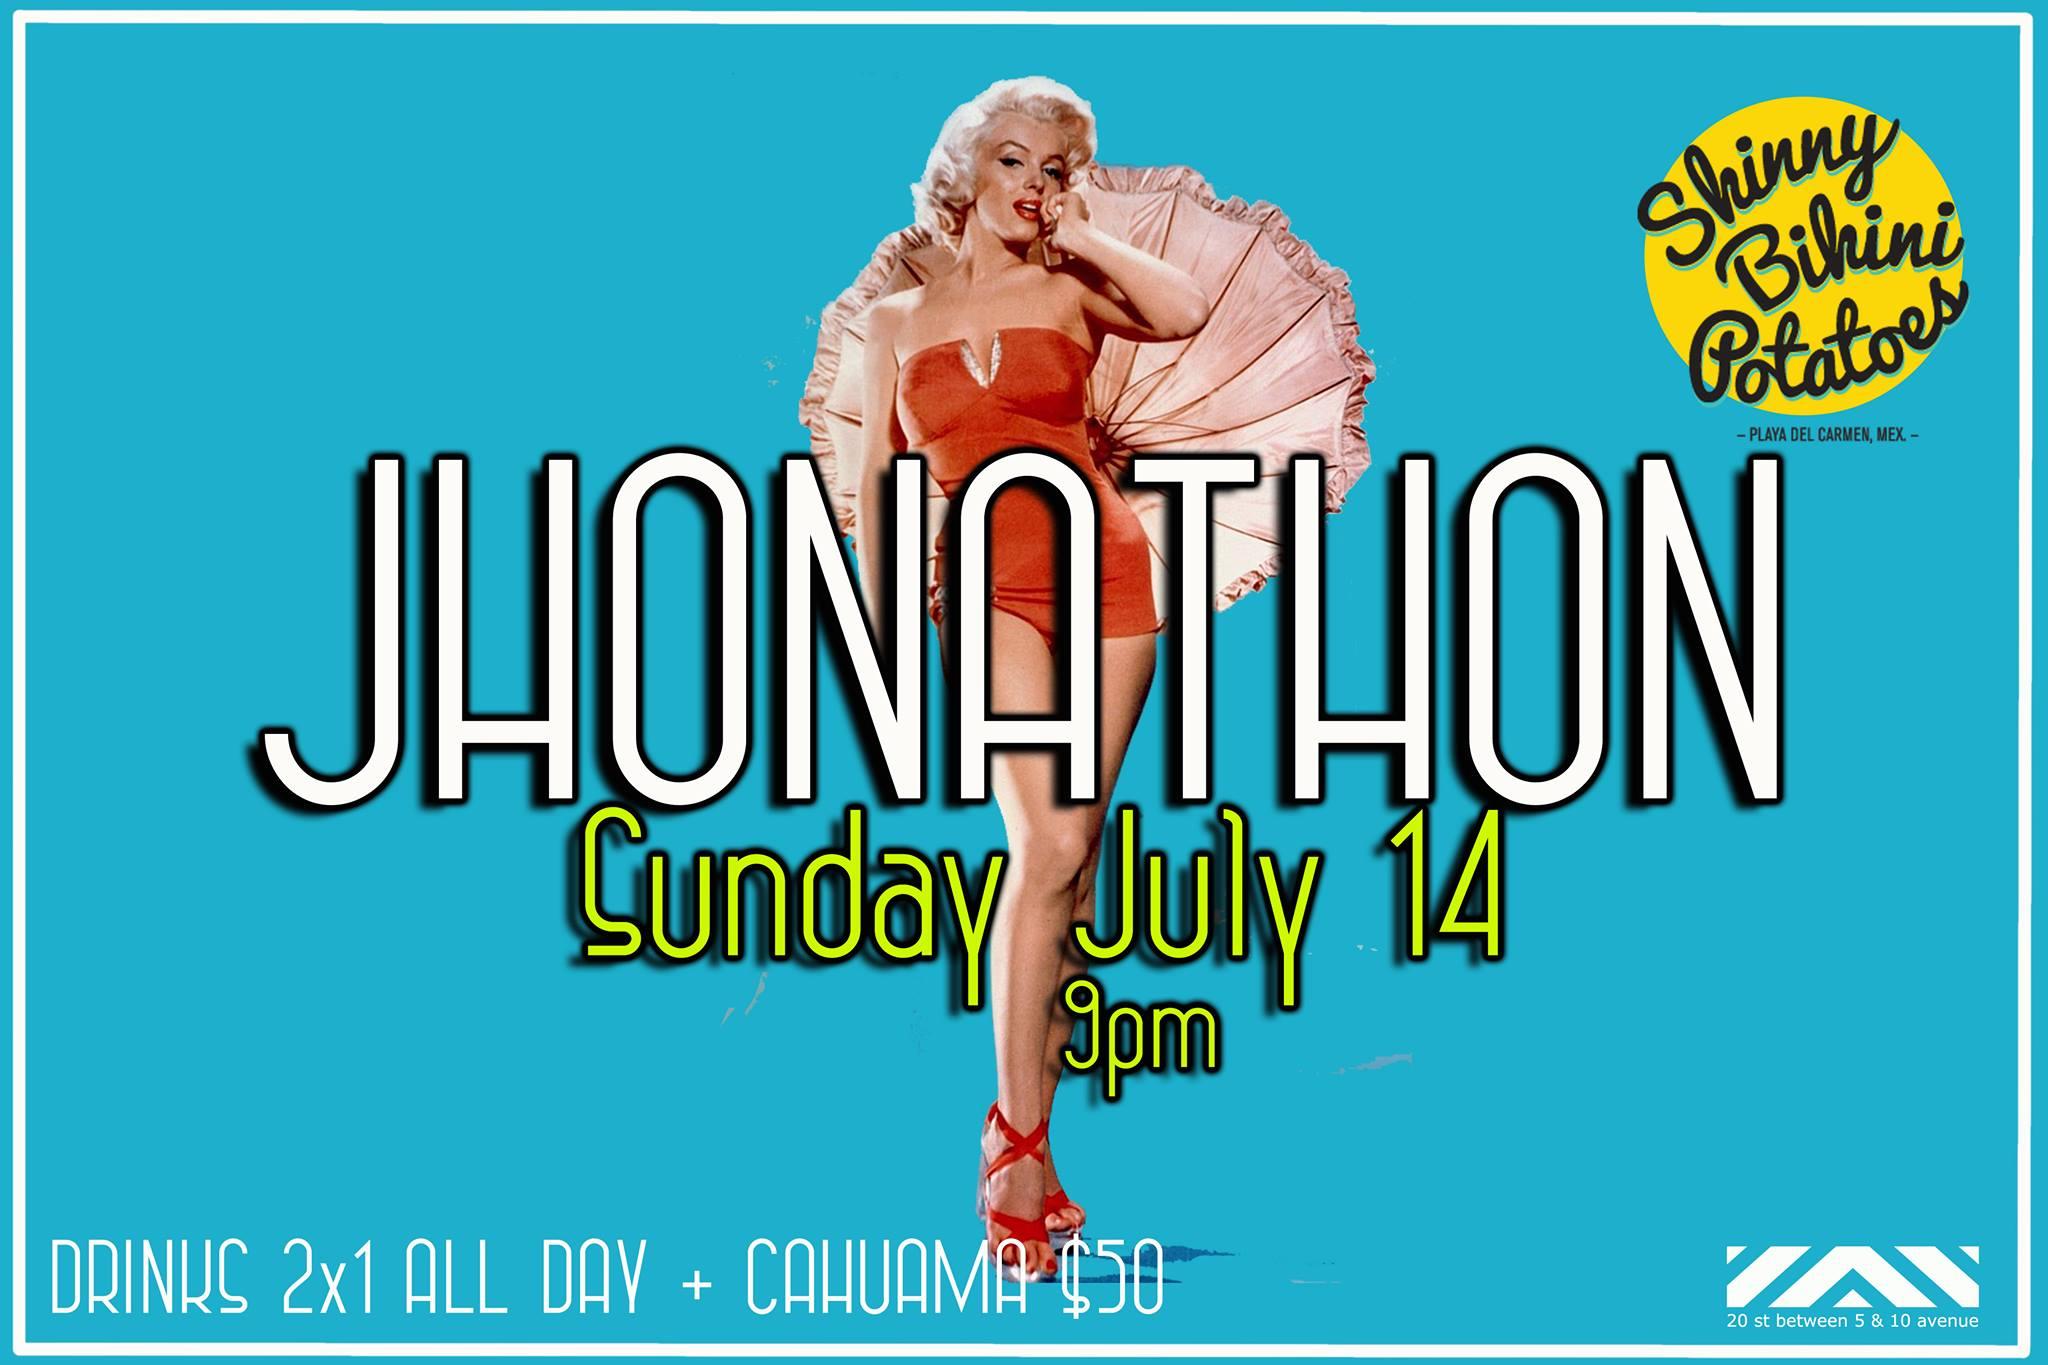 Hoy : Jonathon @ Skinny Bikini Potatoes